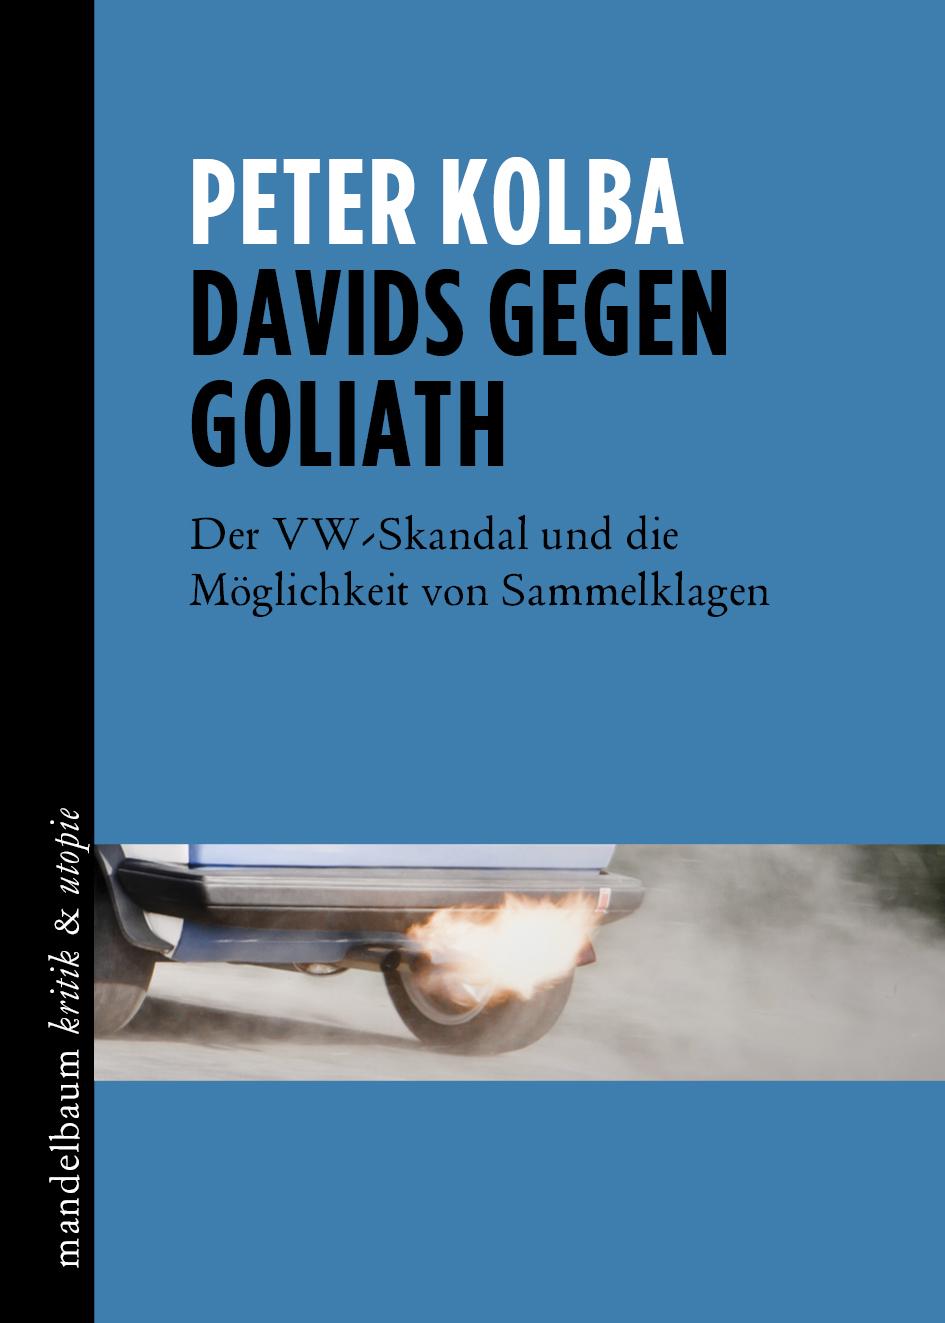 DavidgegenGoliath